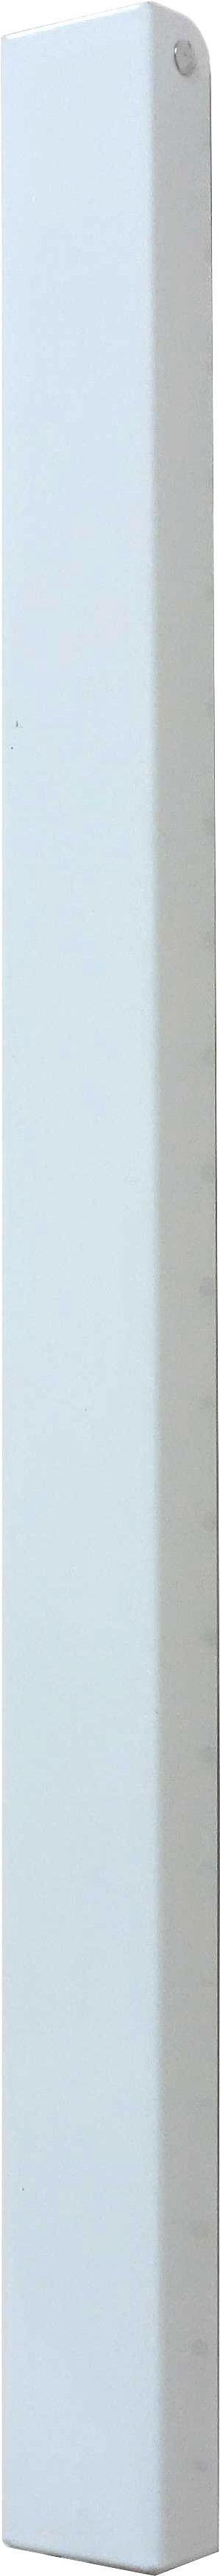 Hakenleiste in Weiß aus Metall - Weiß, Metall (4,3/44/2,3-42cm) - MÖMAX modern living